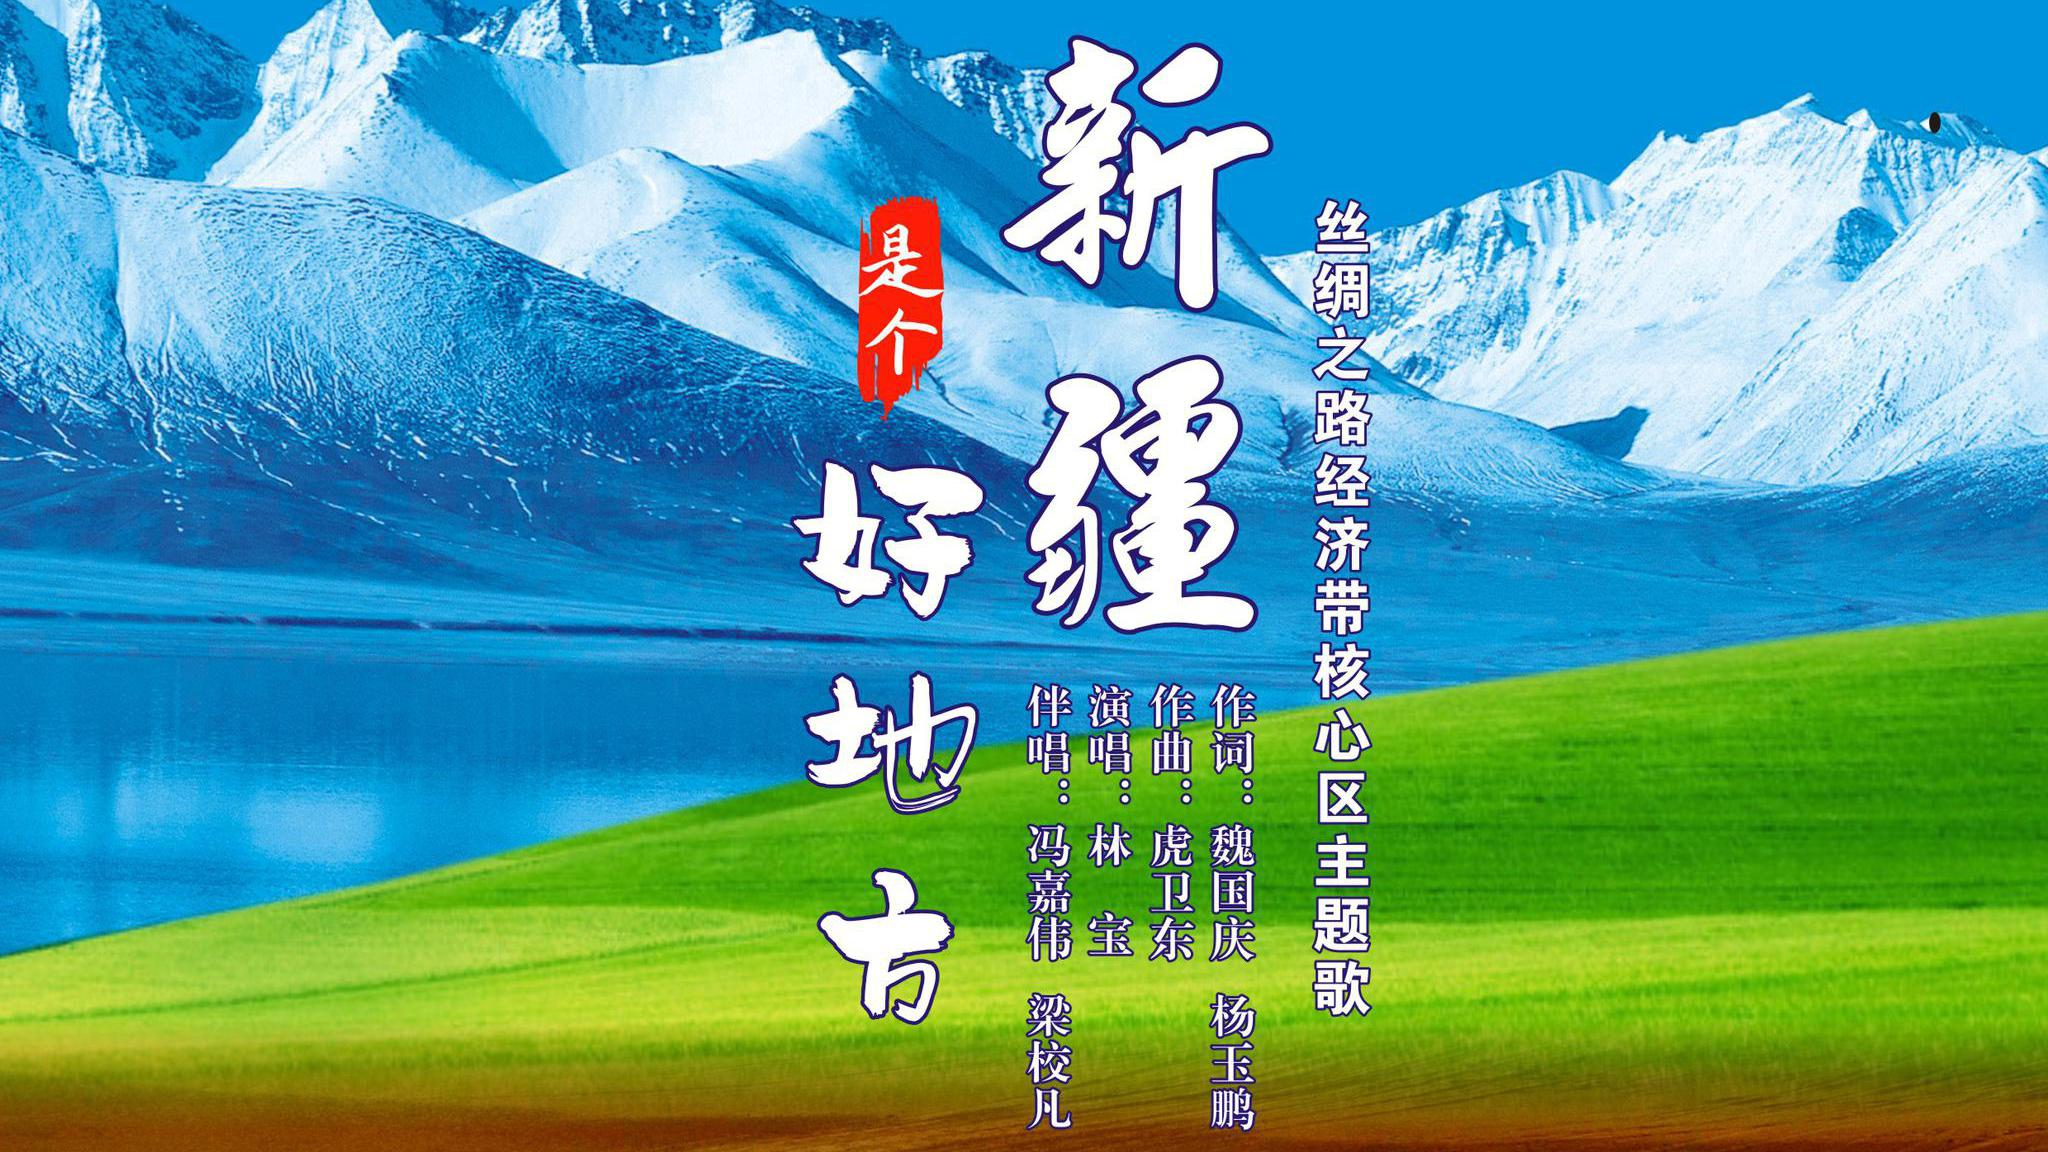 (MV)林宝《新疆是个好地方(丝绸之路经济带核心区主题歌)》